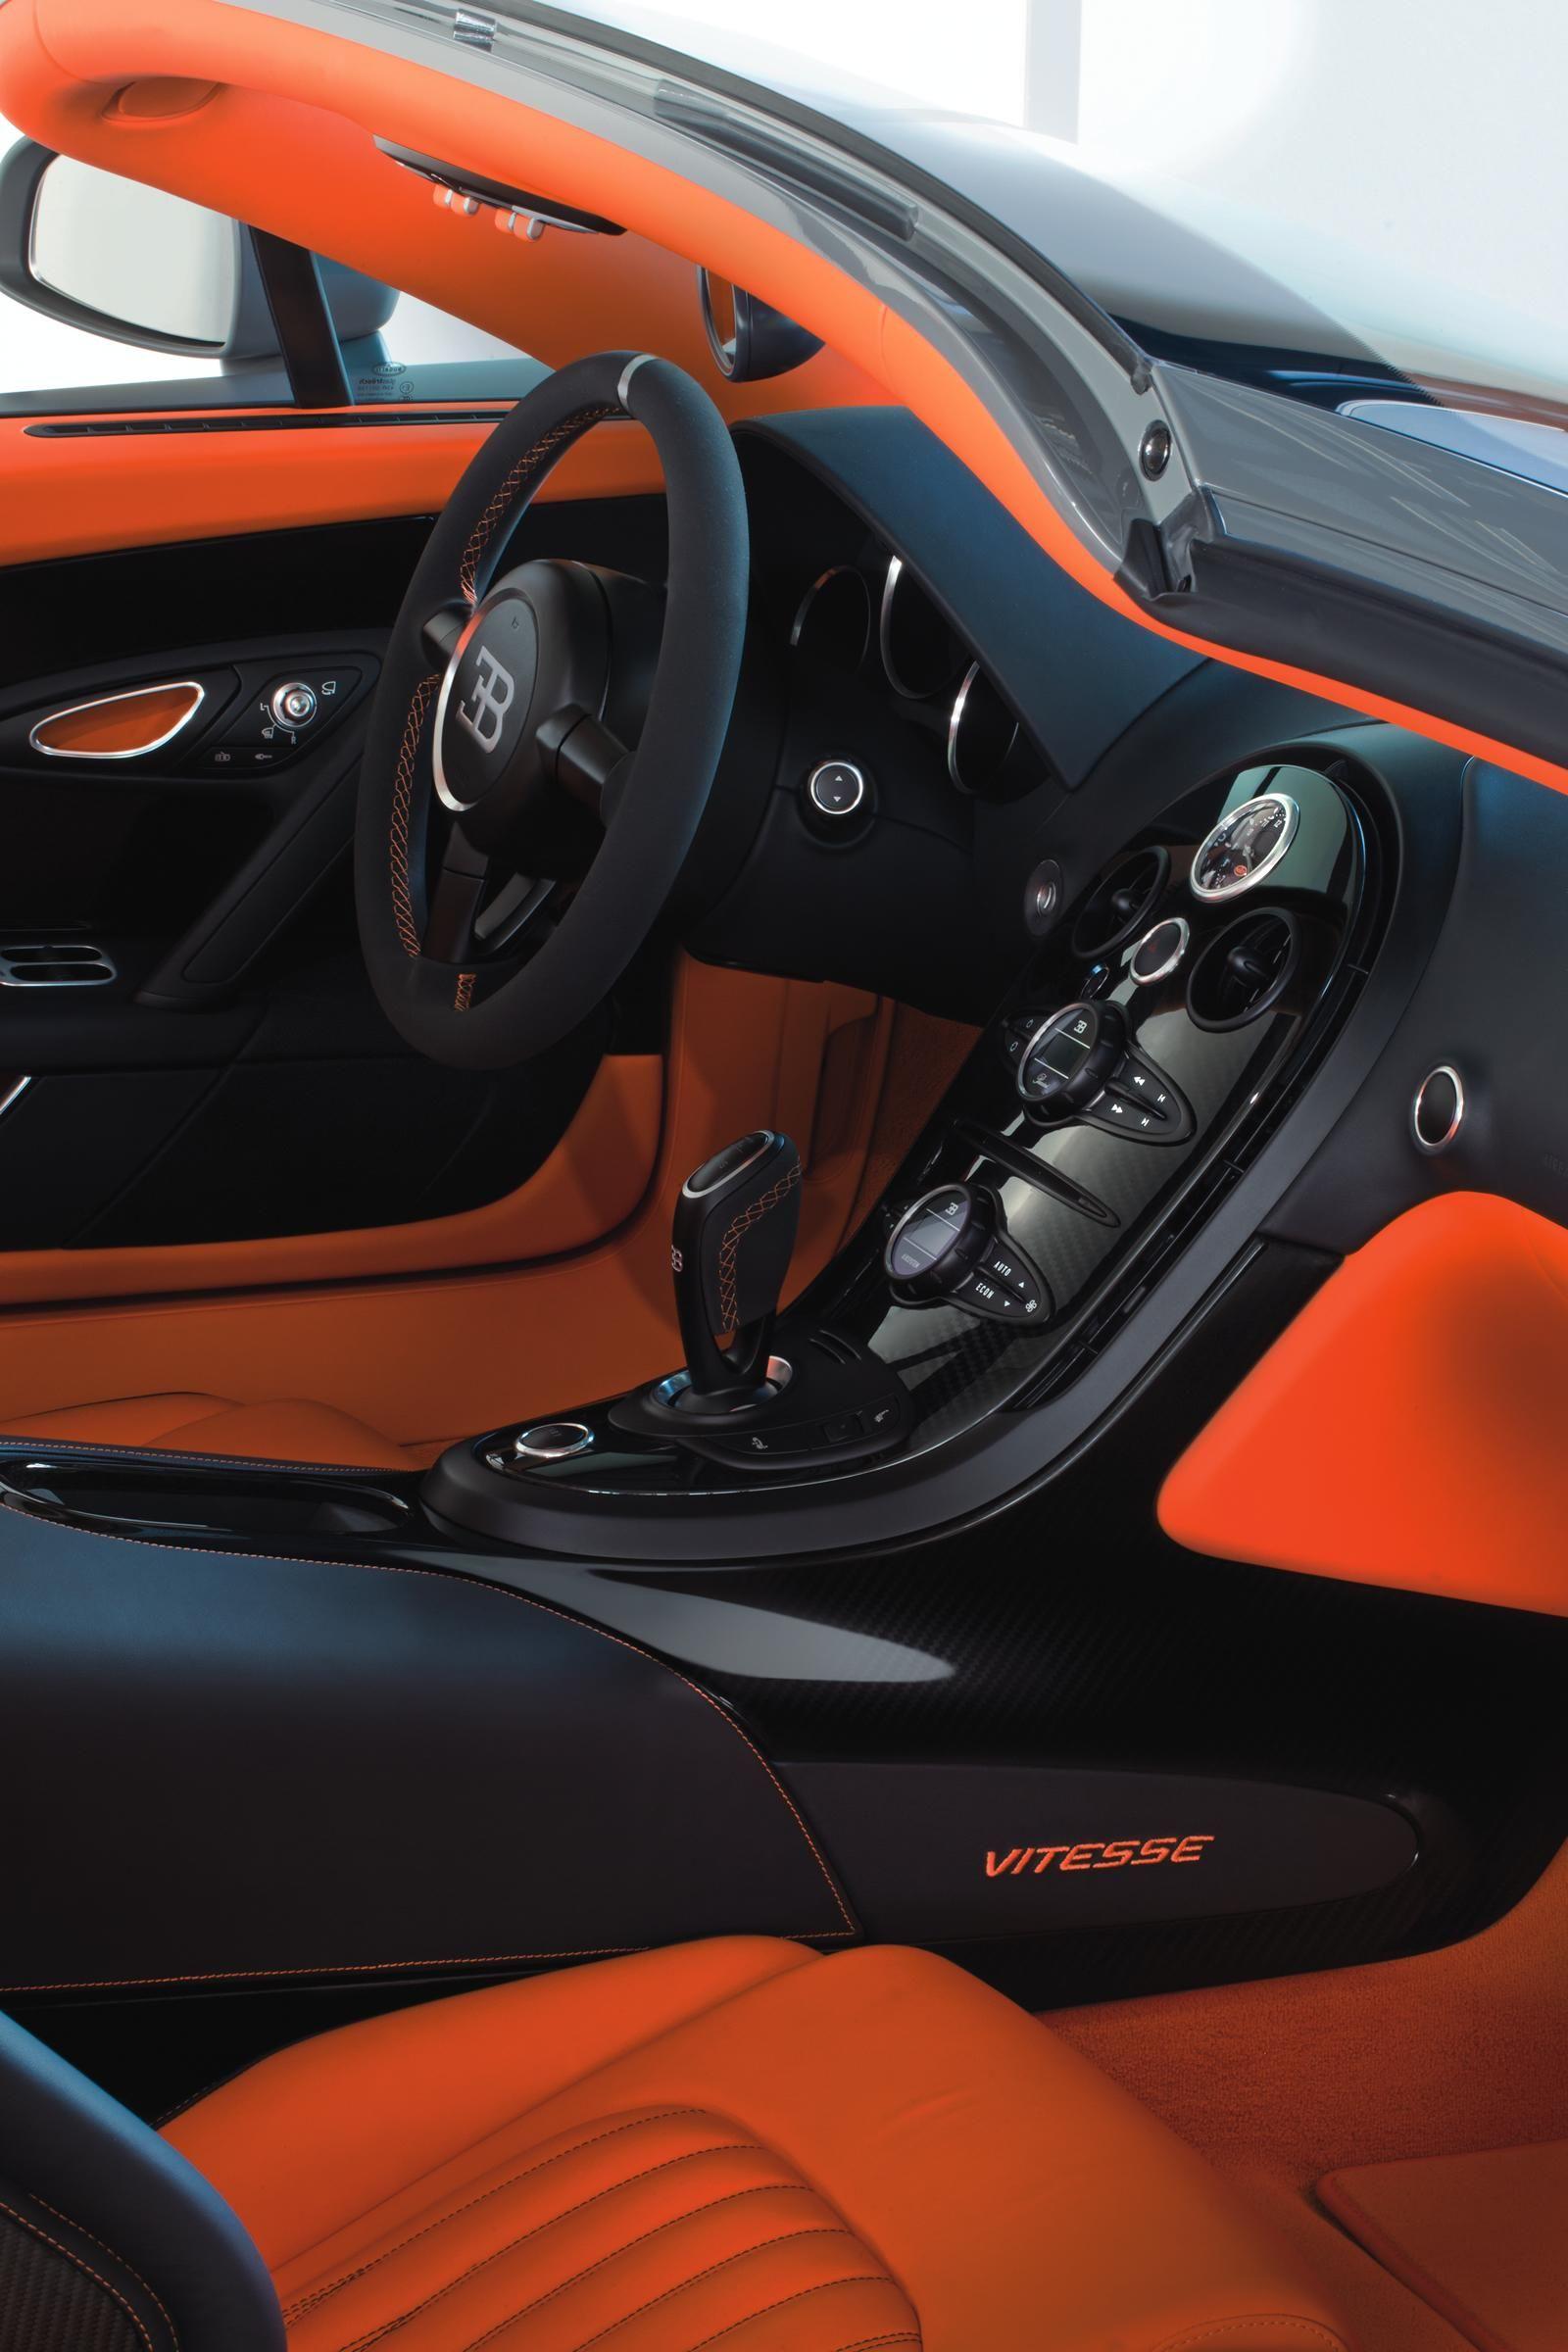 a1965bd622d59a3419da65e49d50471f Stunning Bugatti Veyron 16.4 Grand Sport Vitesse Interior Cars Trend